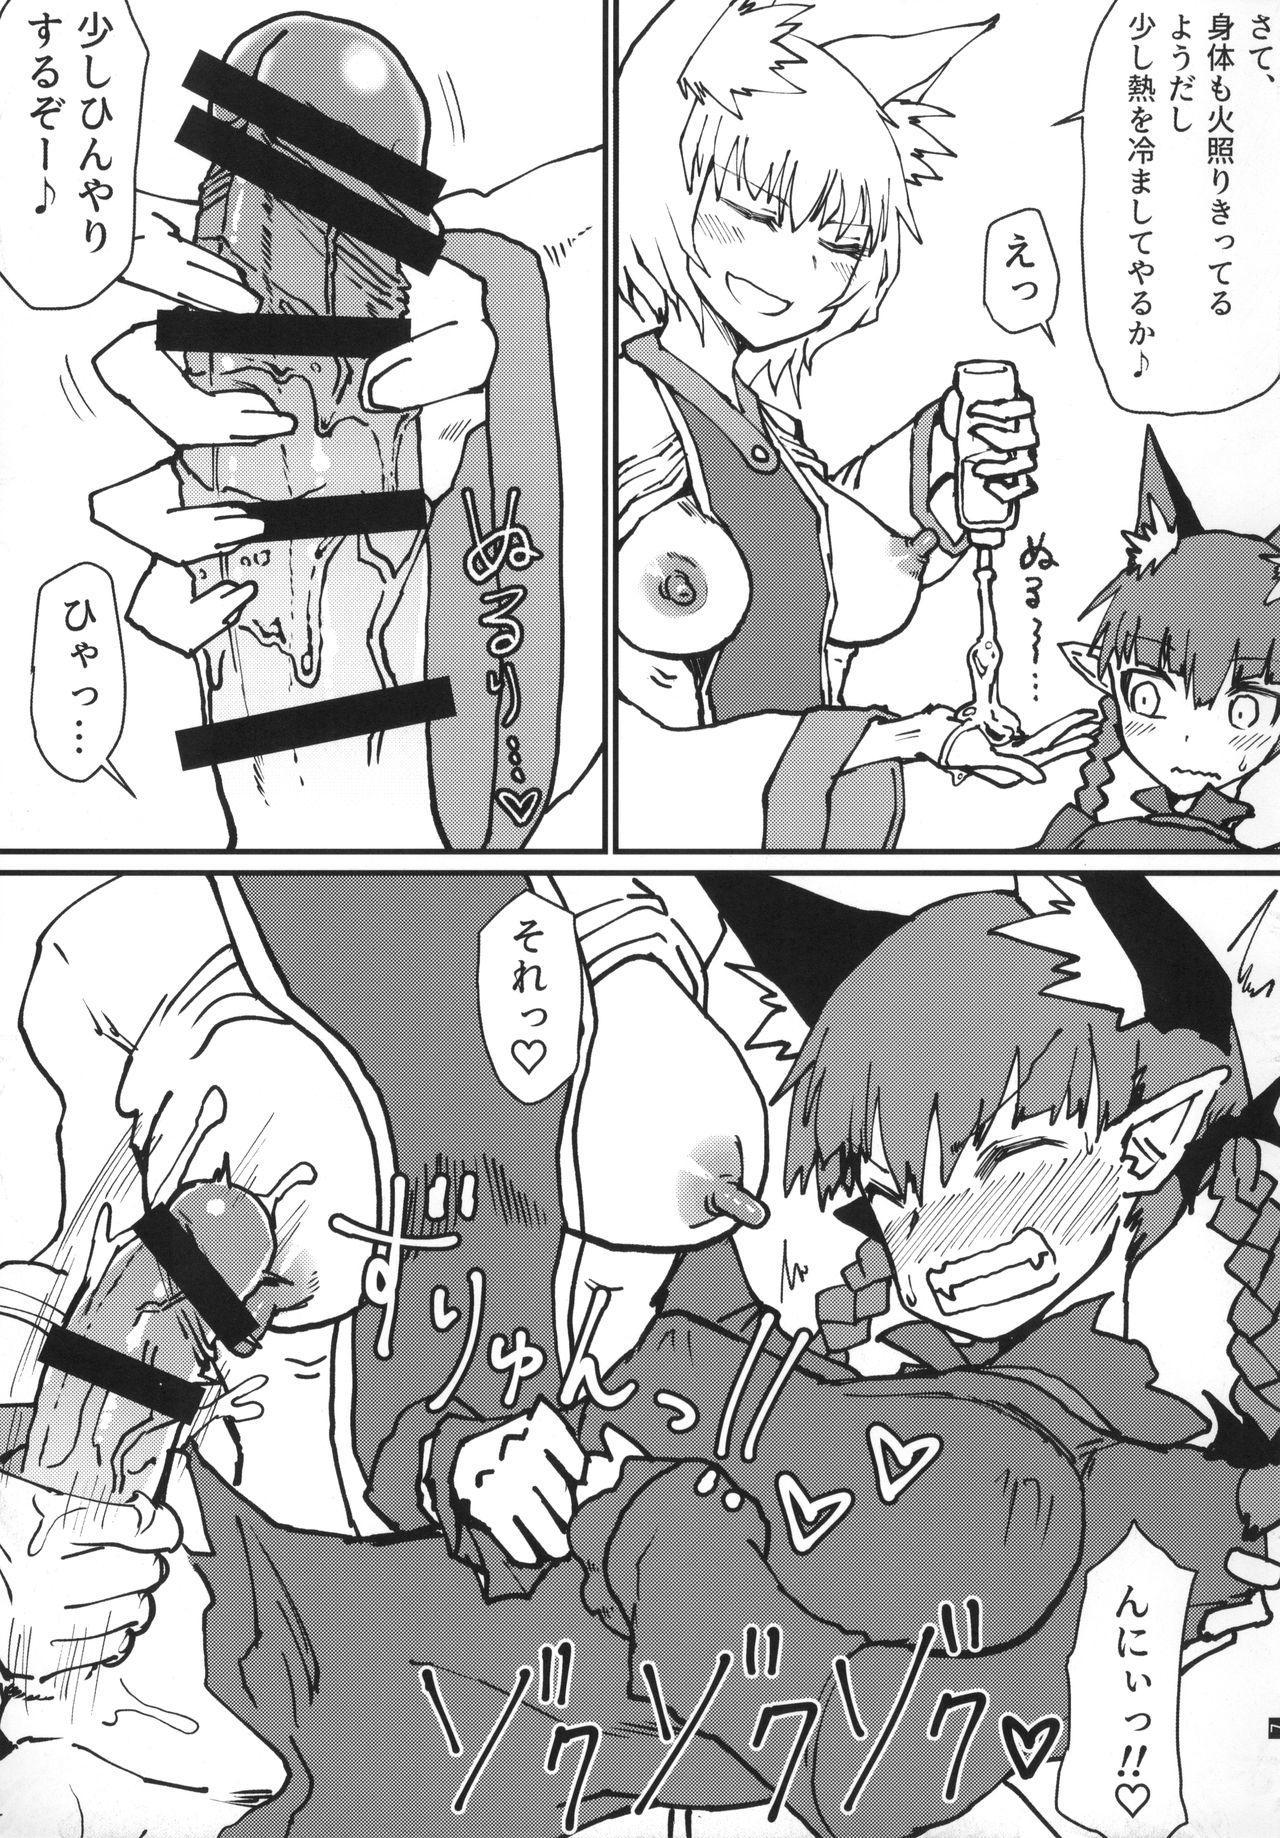 Orin-chan o Tappuri Amae Sasete Takusan Shasei Sasete Ageru Hon. 7